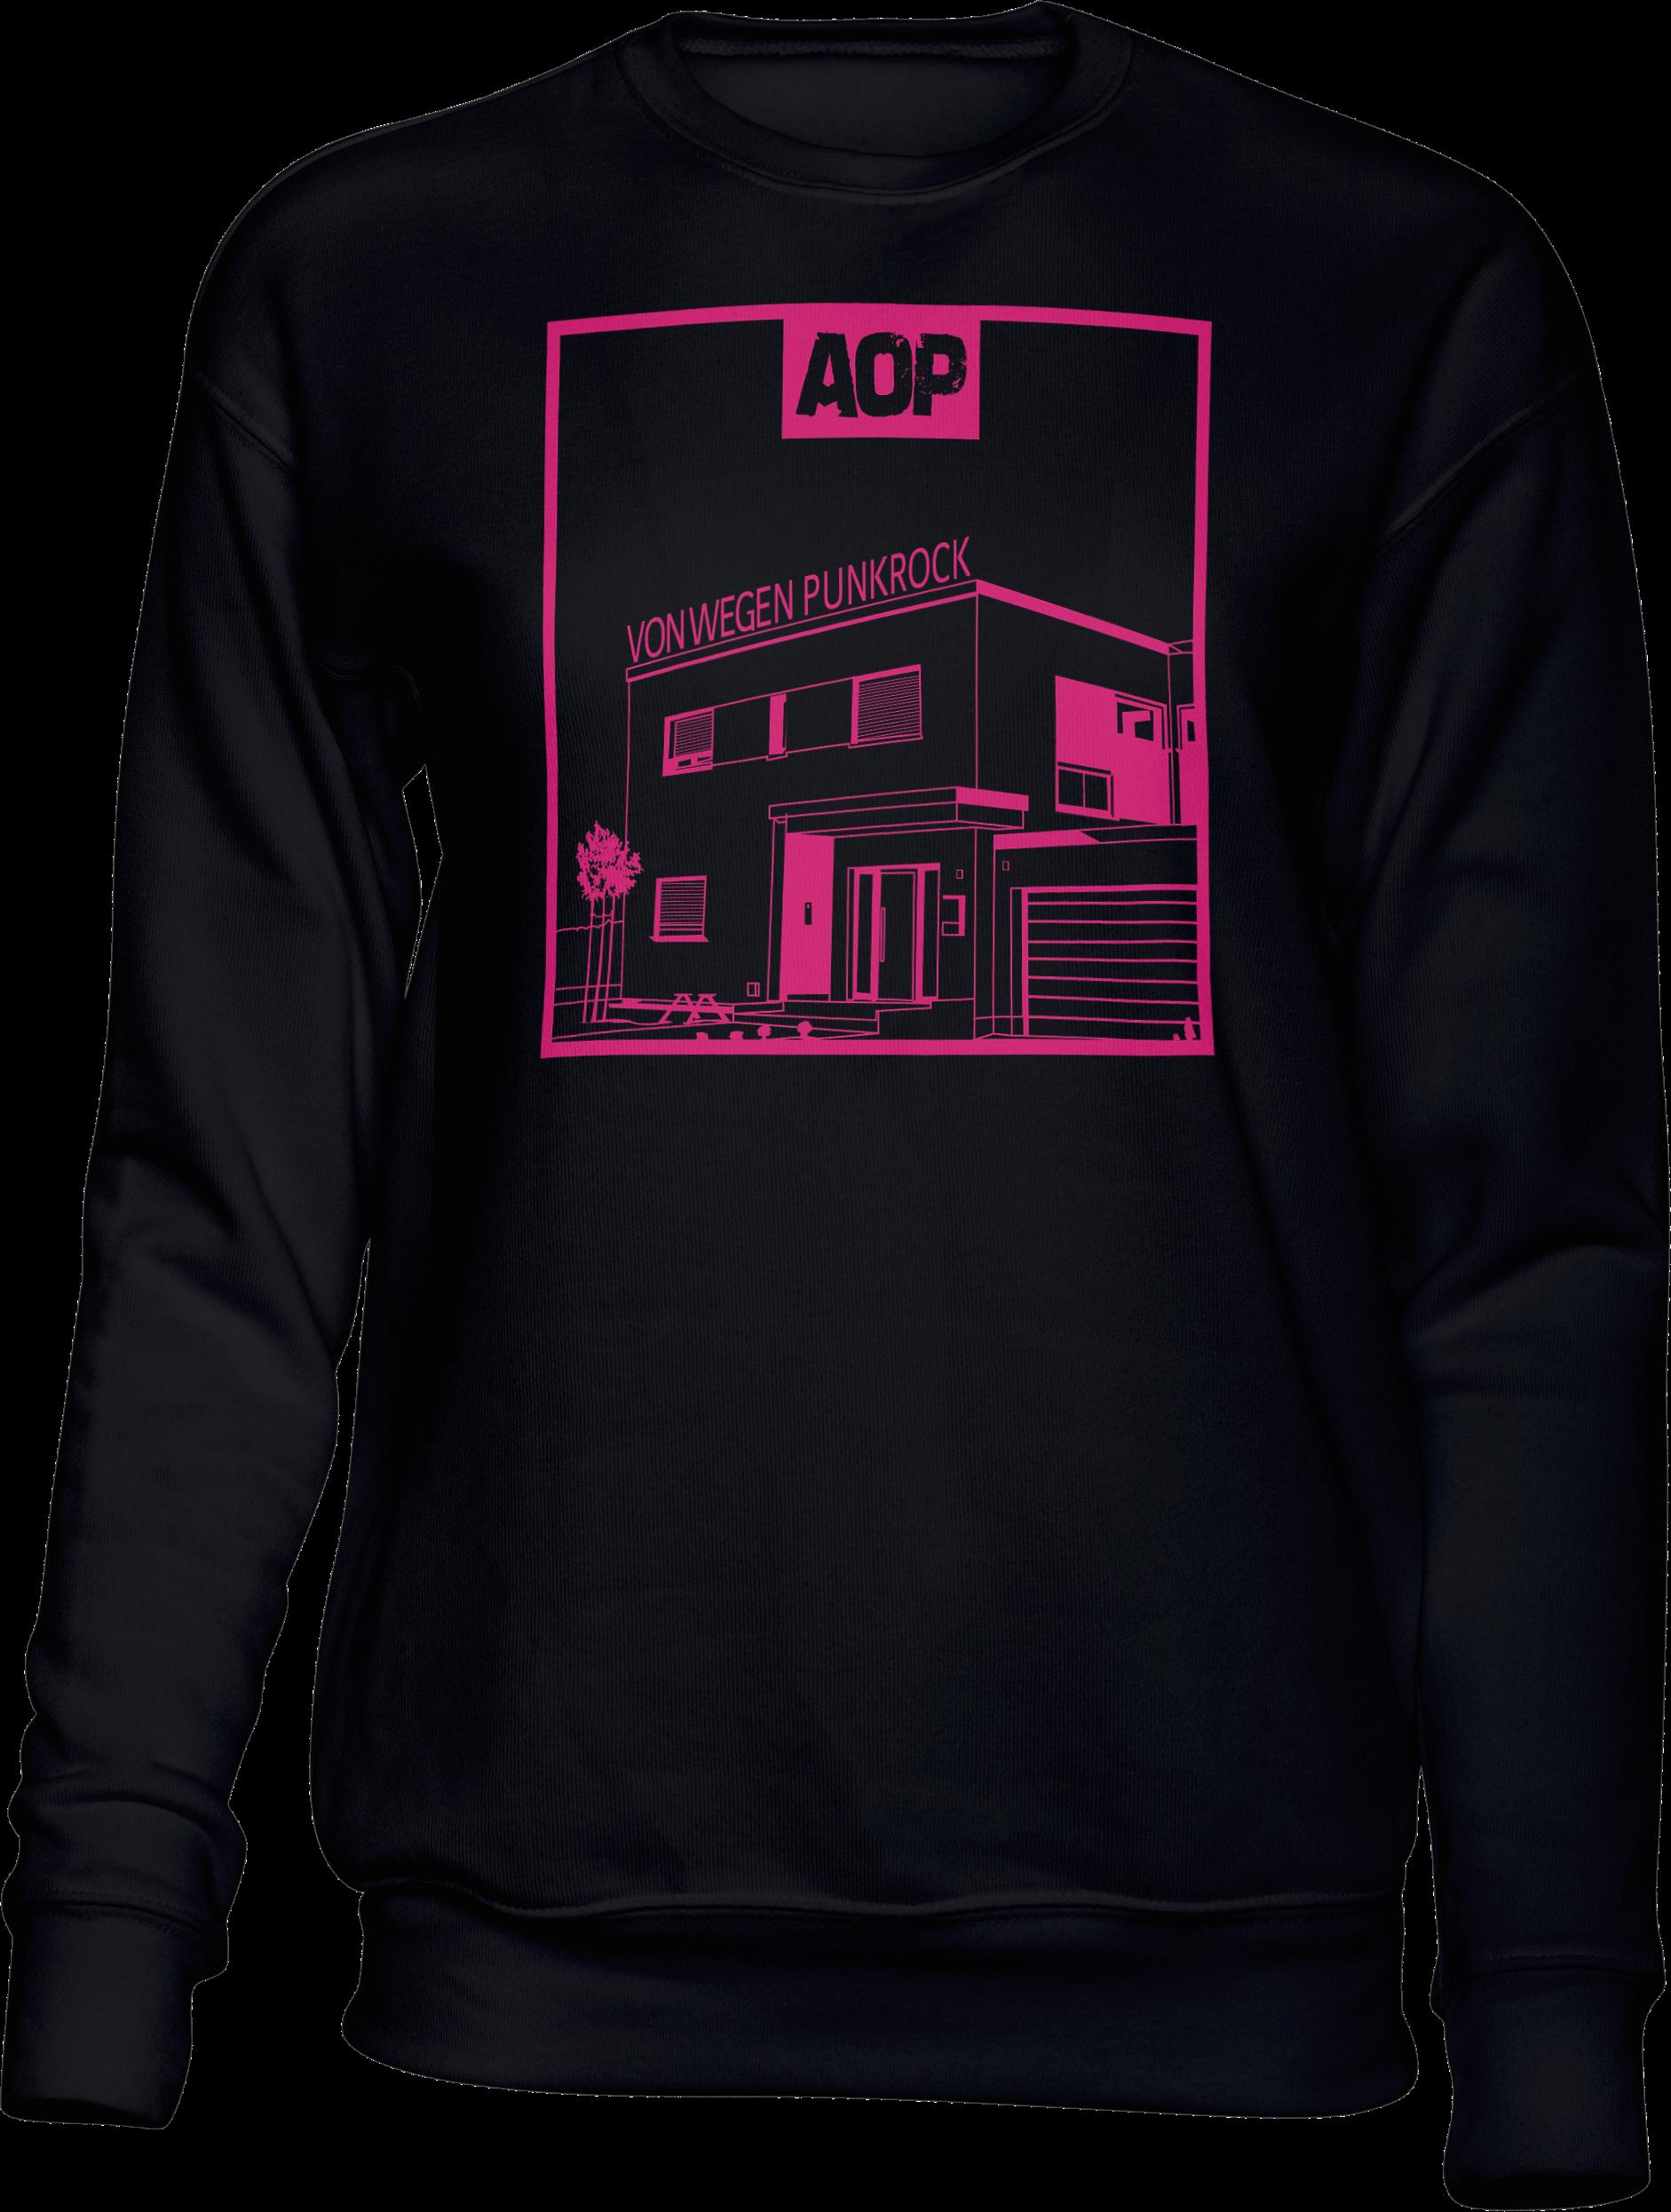 AOP – Von wegen Punkrock – Sweatshirt (schwarz)